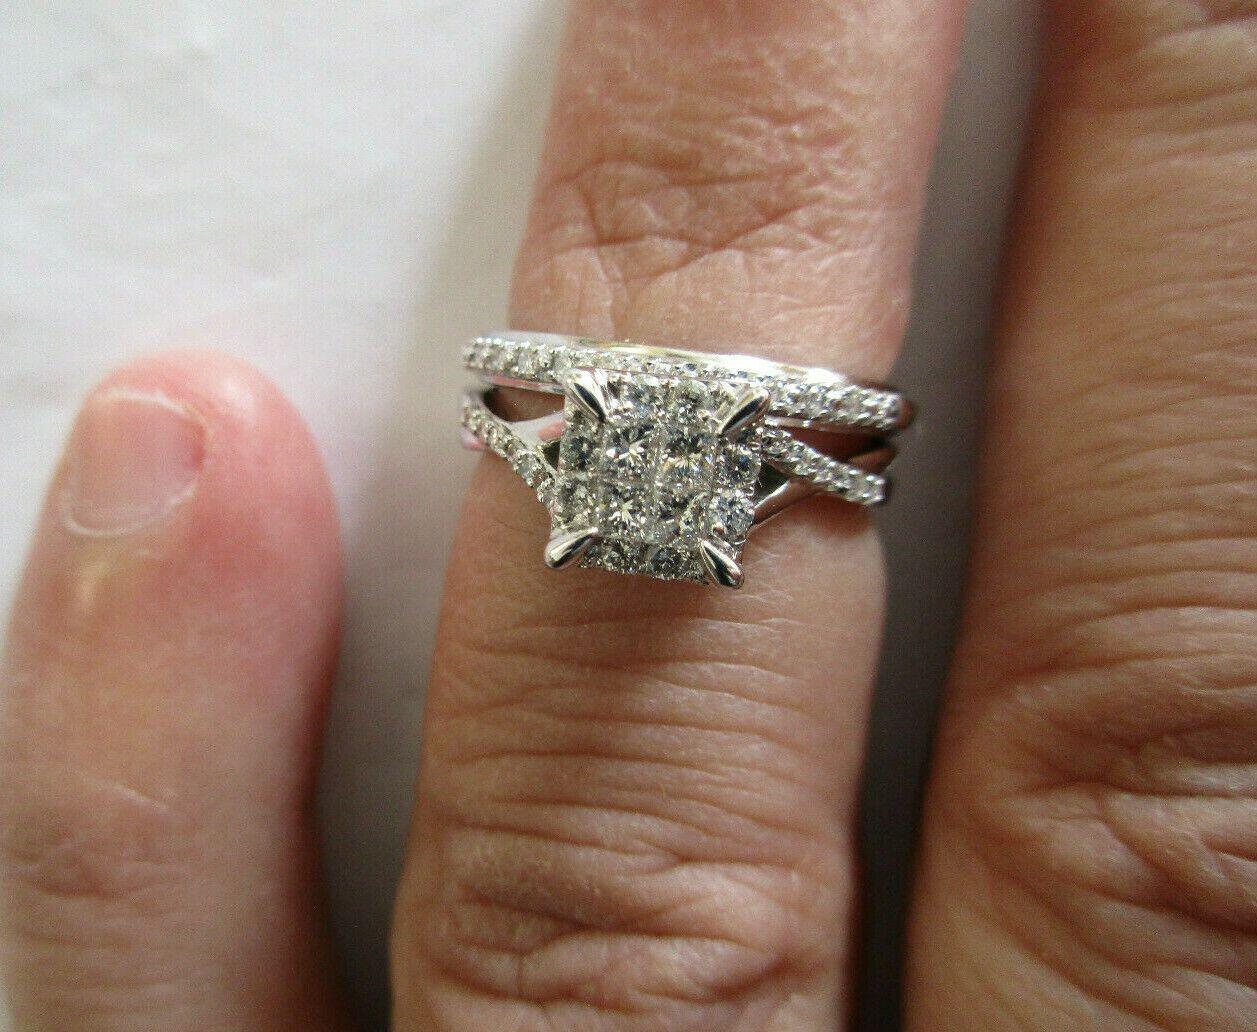 10k Gold Diamond Engagement Ring Set Tcw 1 05 Carat D Vs1 Size 5 Value 3950 Black Diamond Ring Black Diamond Ring Diamond Engagement Ring Set Diamond Ring